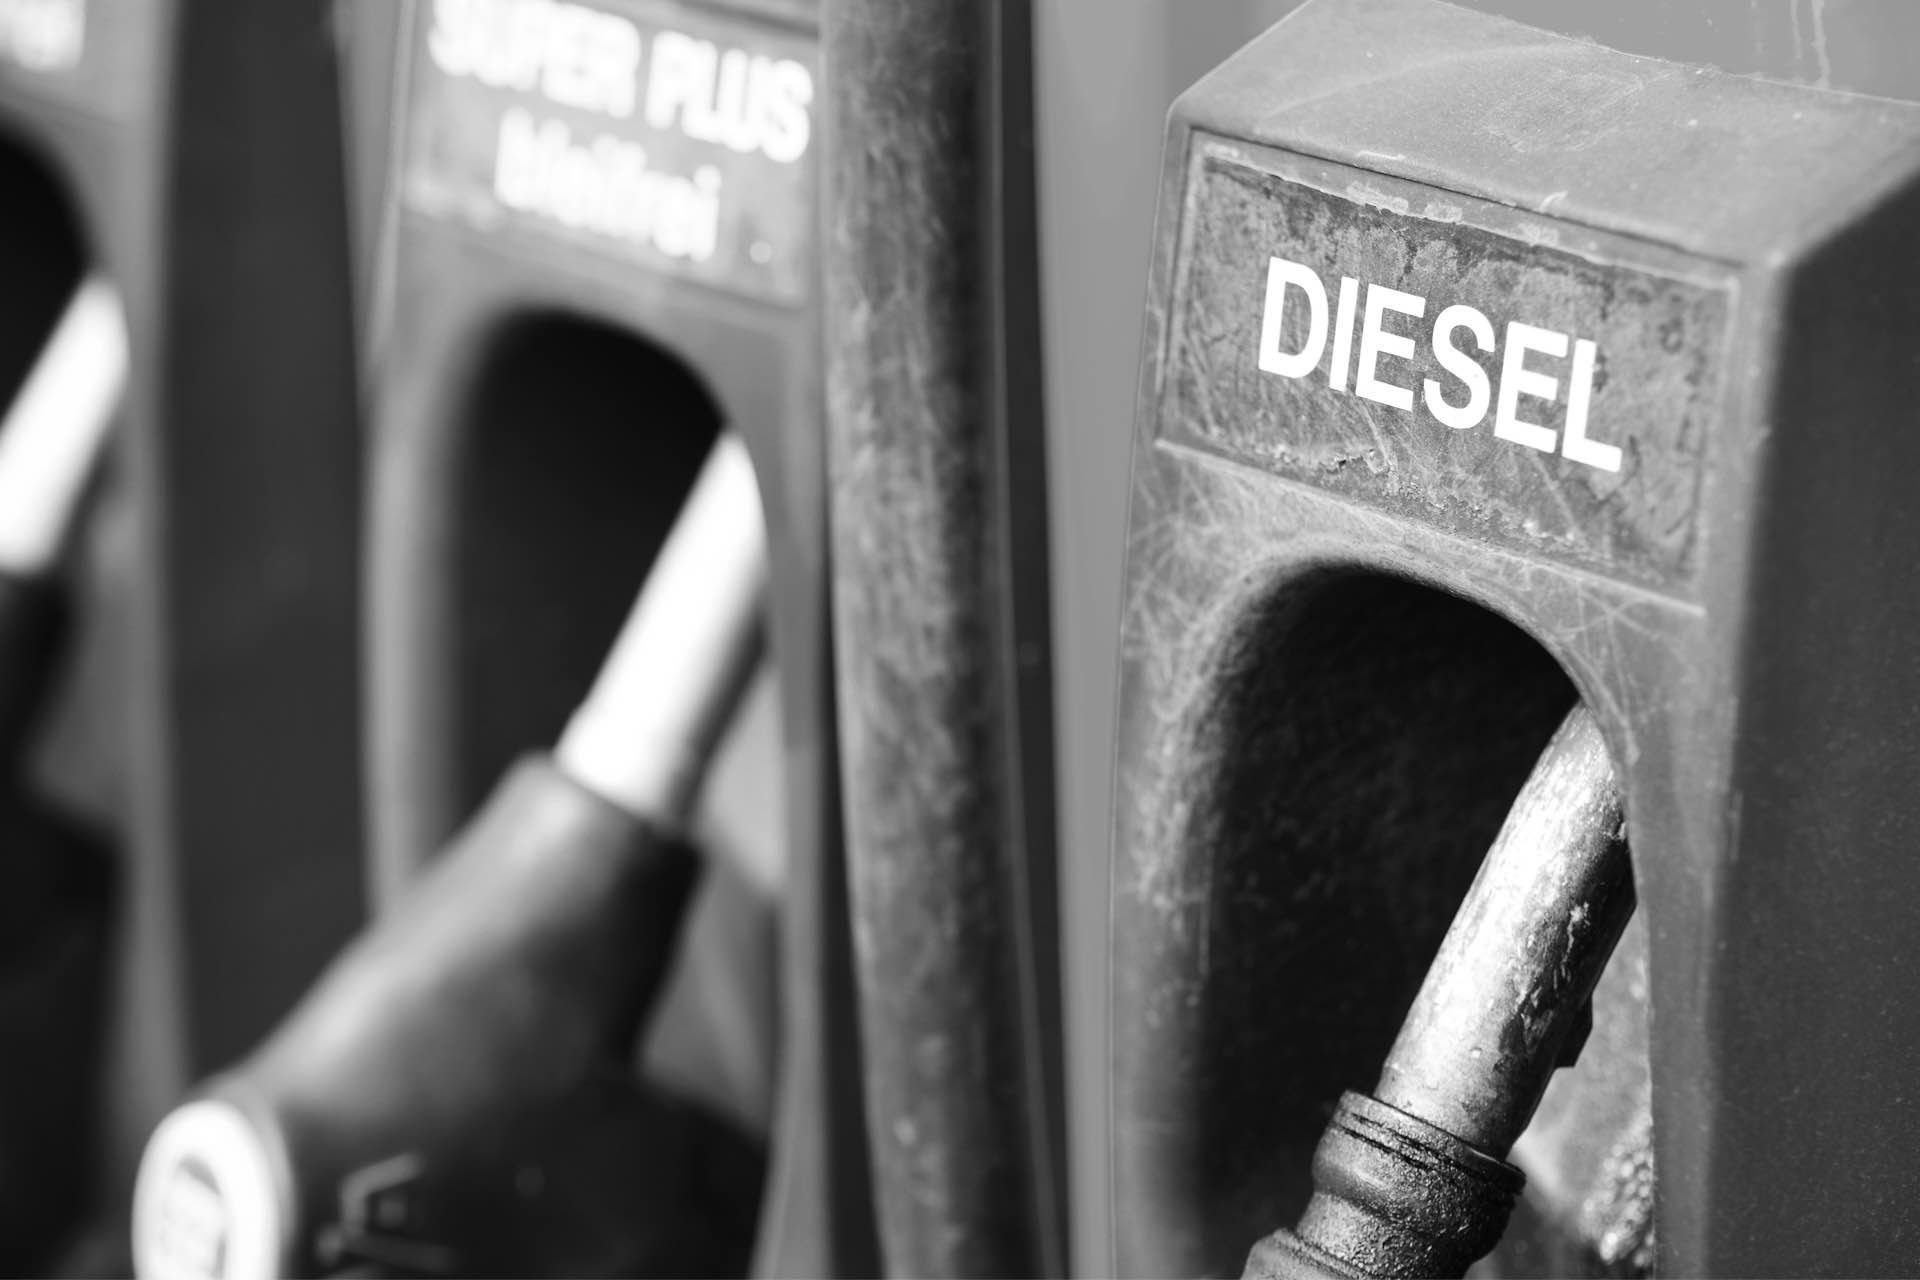 Diesel-Abgasskandal-Rechtsanwalt-Kaufmann-Niedersachsen